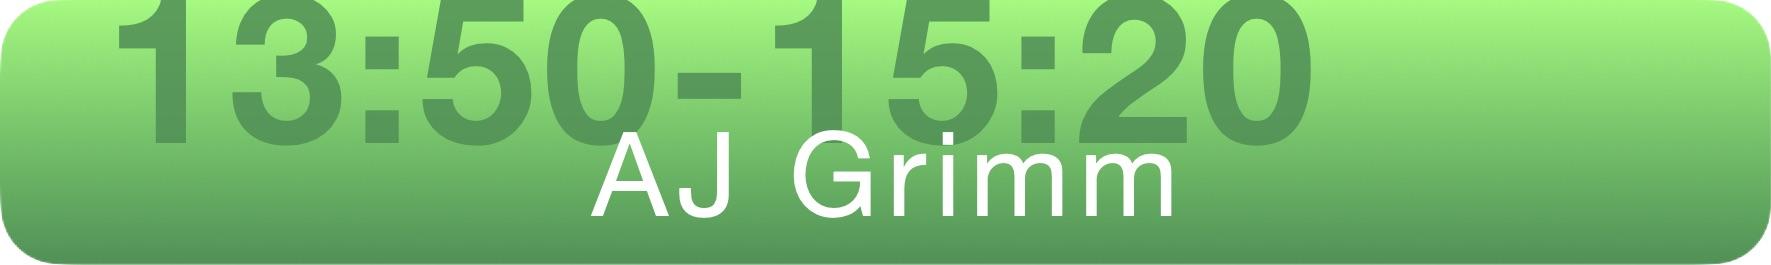 aa-aj-grimm-1350